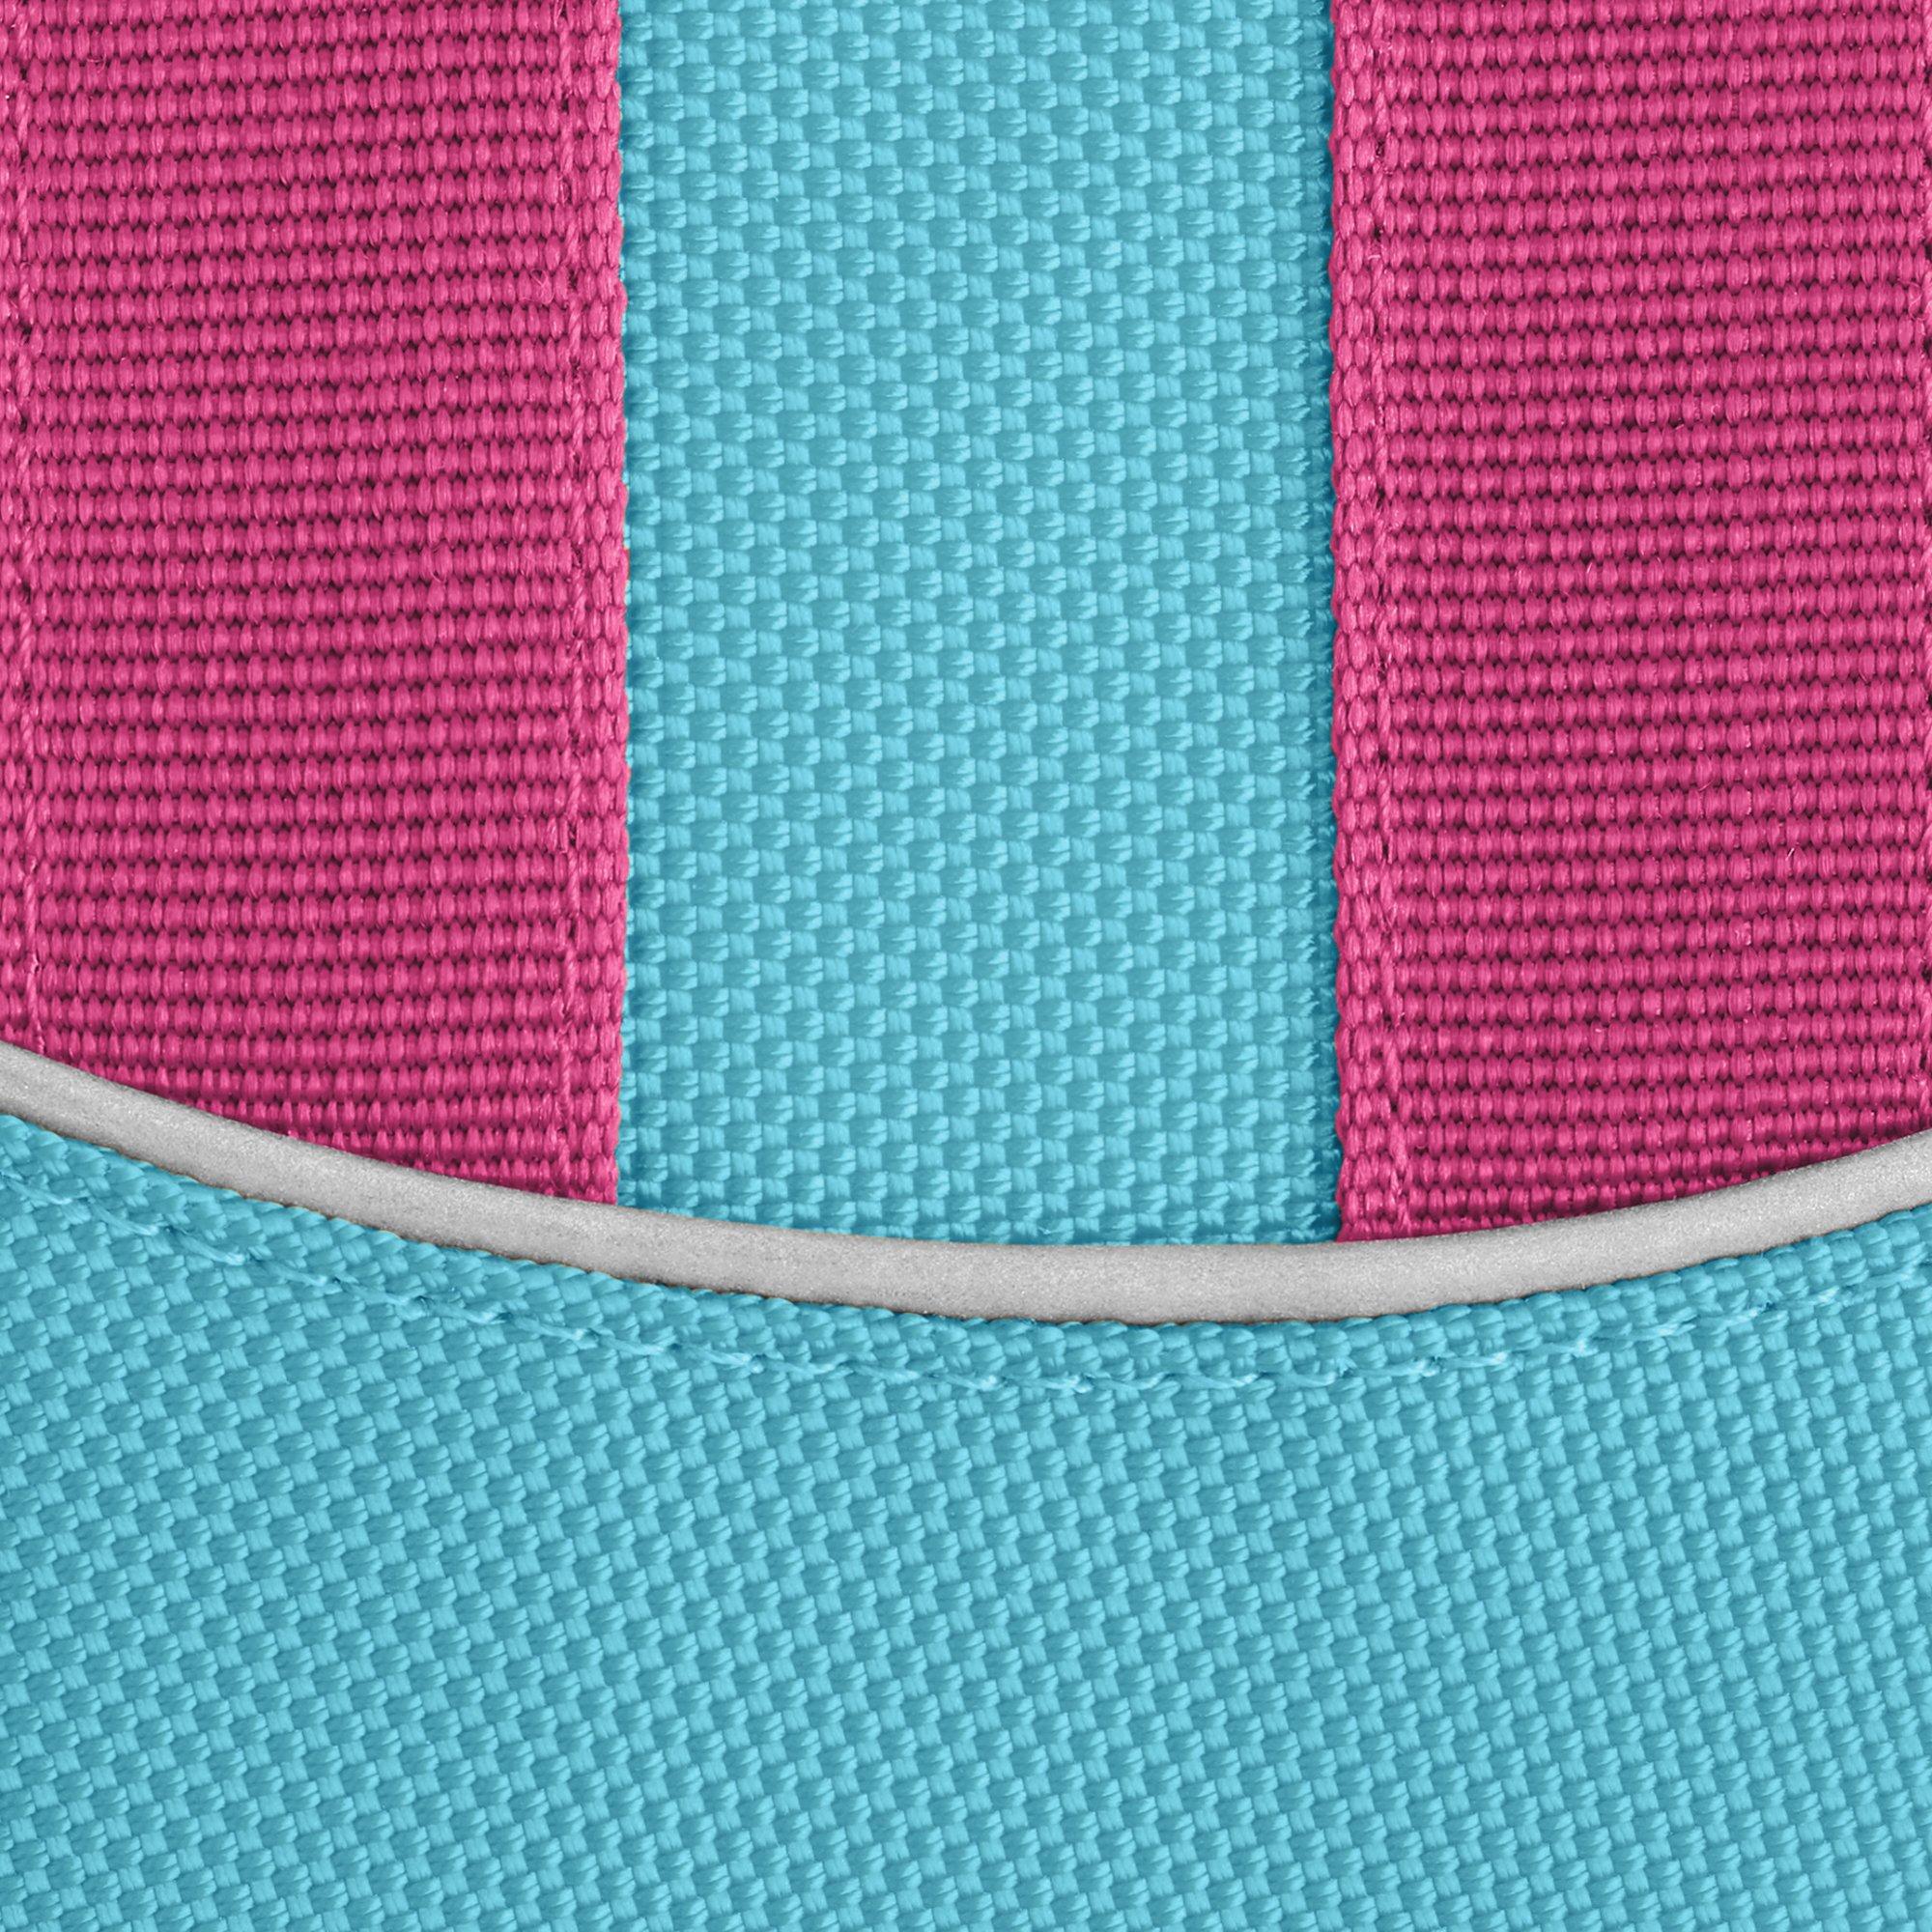 RUFFWEAR - Float Coat Reflective Life Jacket for Dogs, Blue Atoll, Large by RUFFWEAR (Image #5)